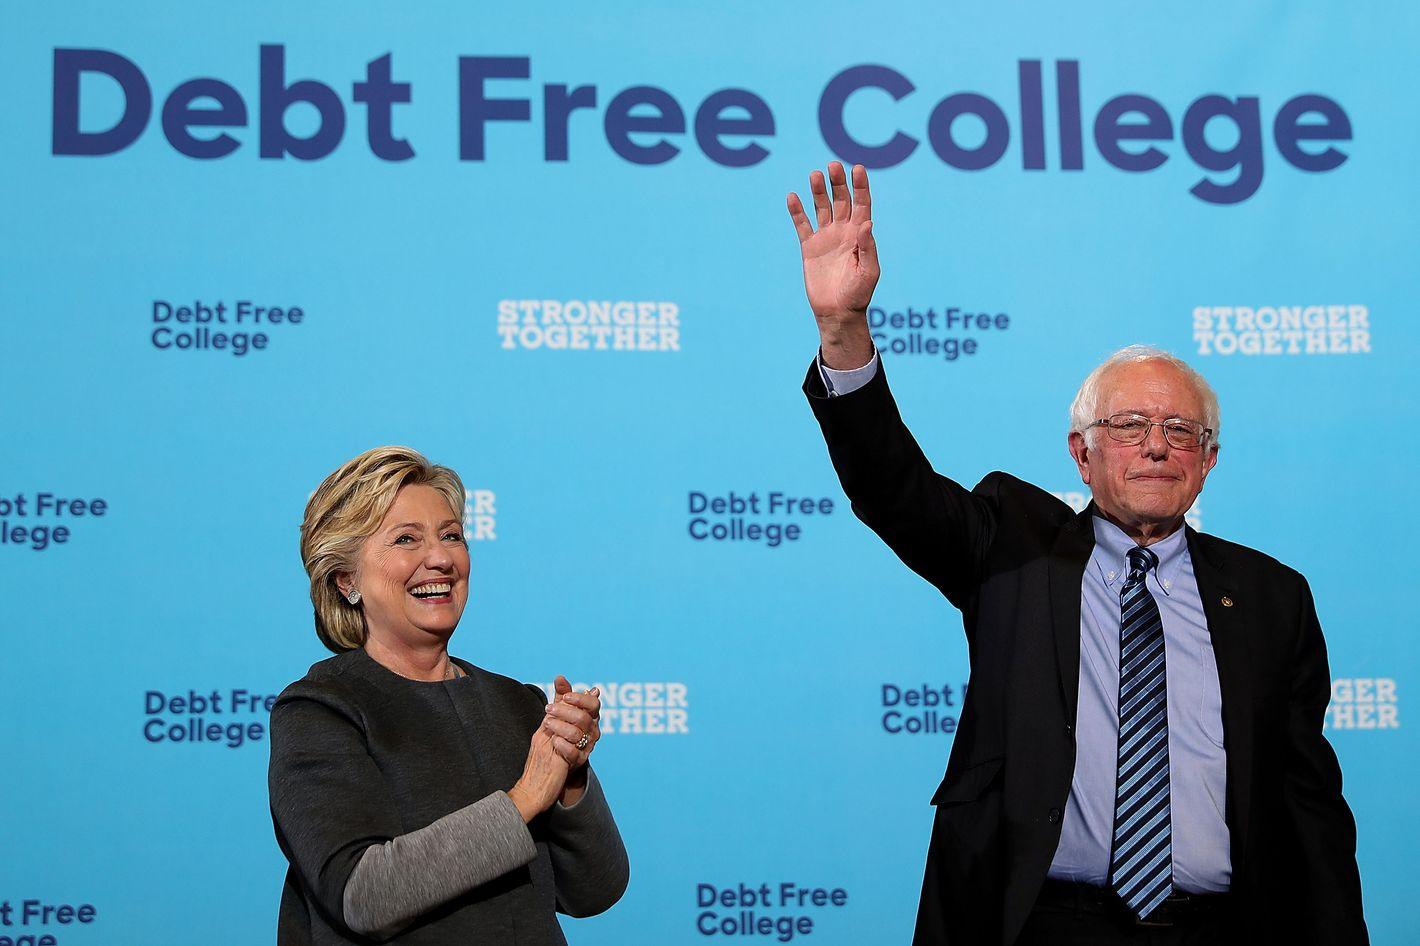 Hacked Audio: Clinton Calls Bernie Fans Frustrated Basement-Dwellers